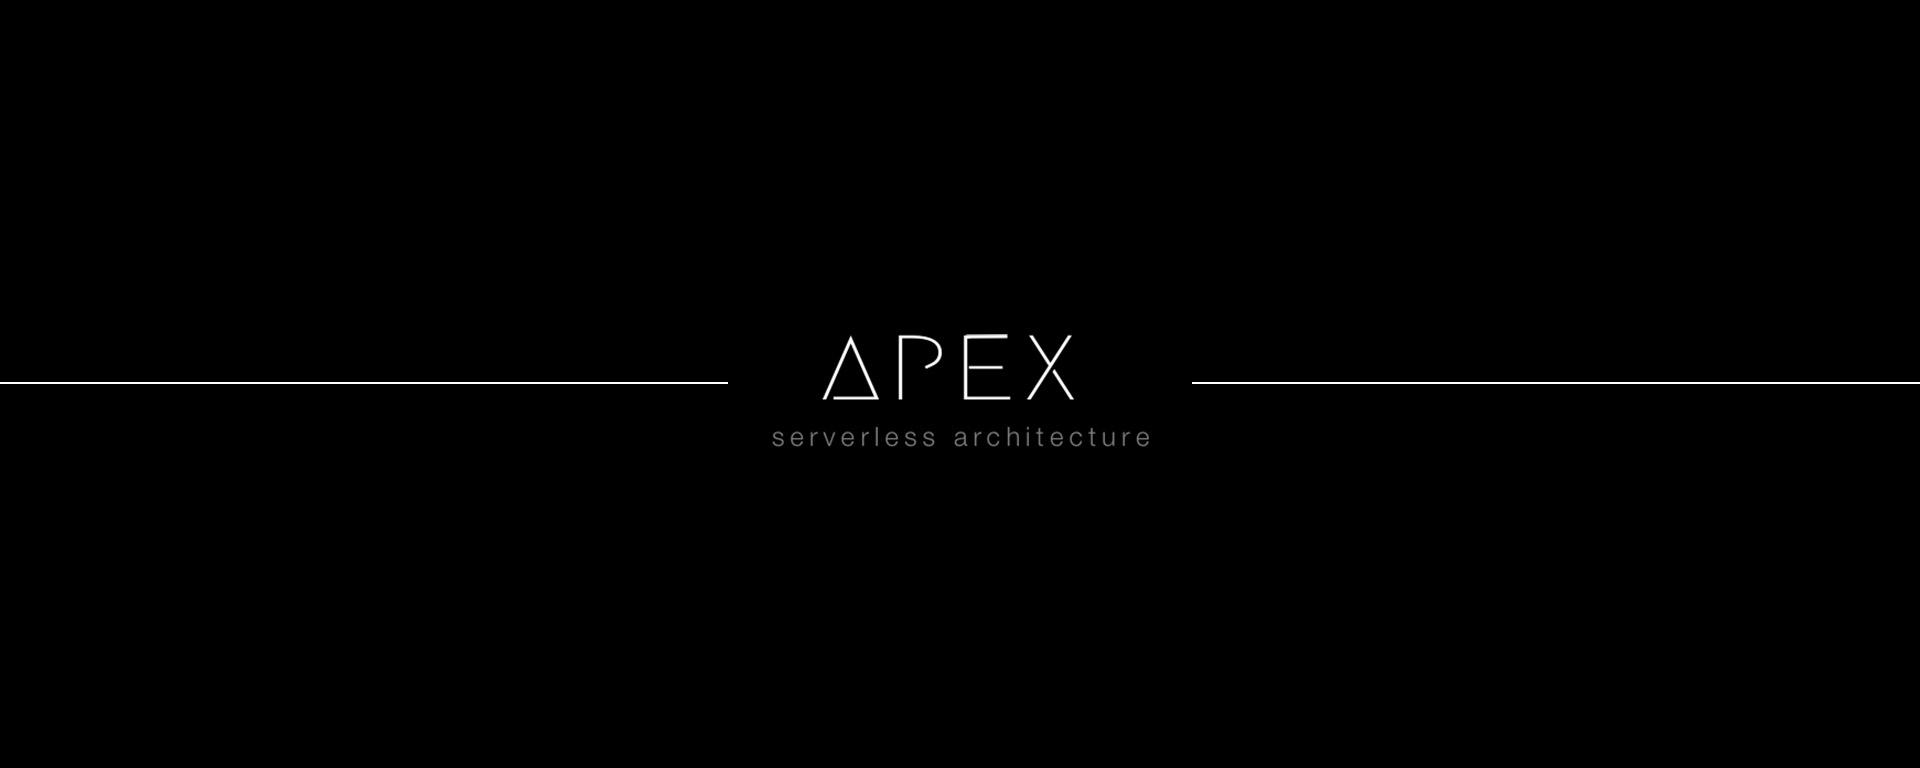 ApexとTerraformとGoでAWS上に構築したCD Pipelineのステータス